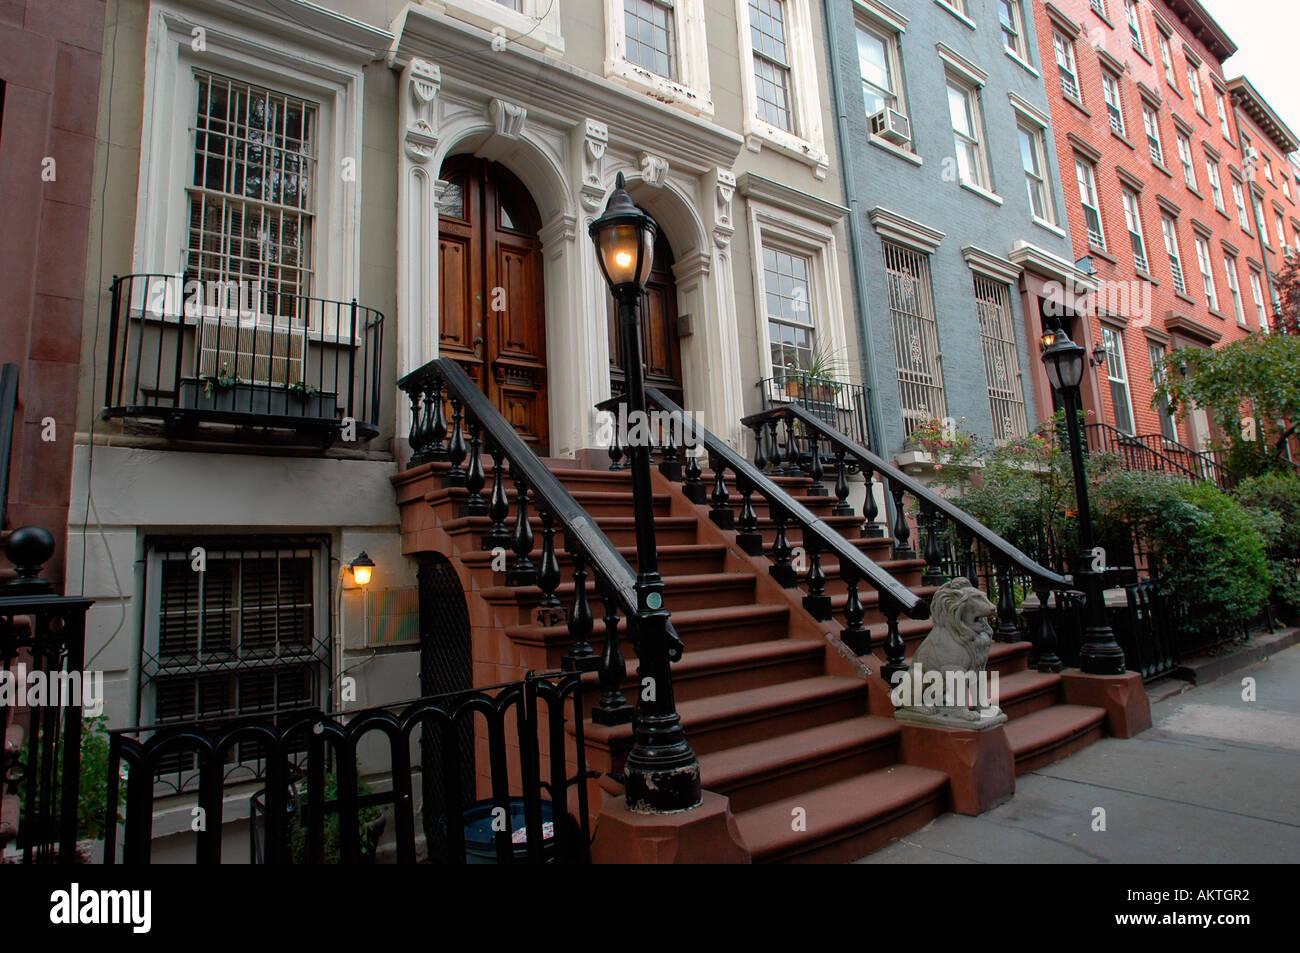 Townhouses In The Chelsea Neighborhood Of Nyc Stock Photo Alamy